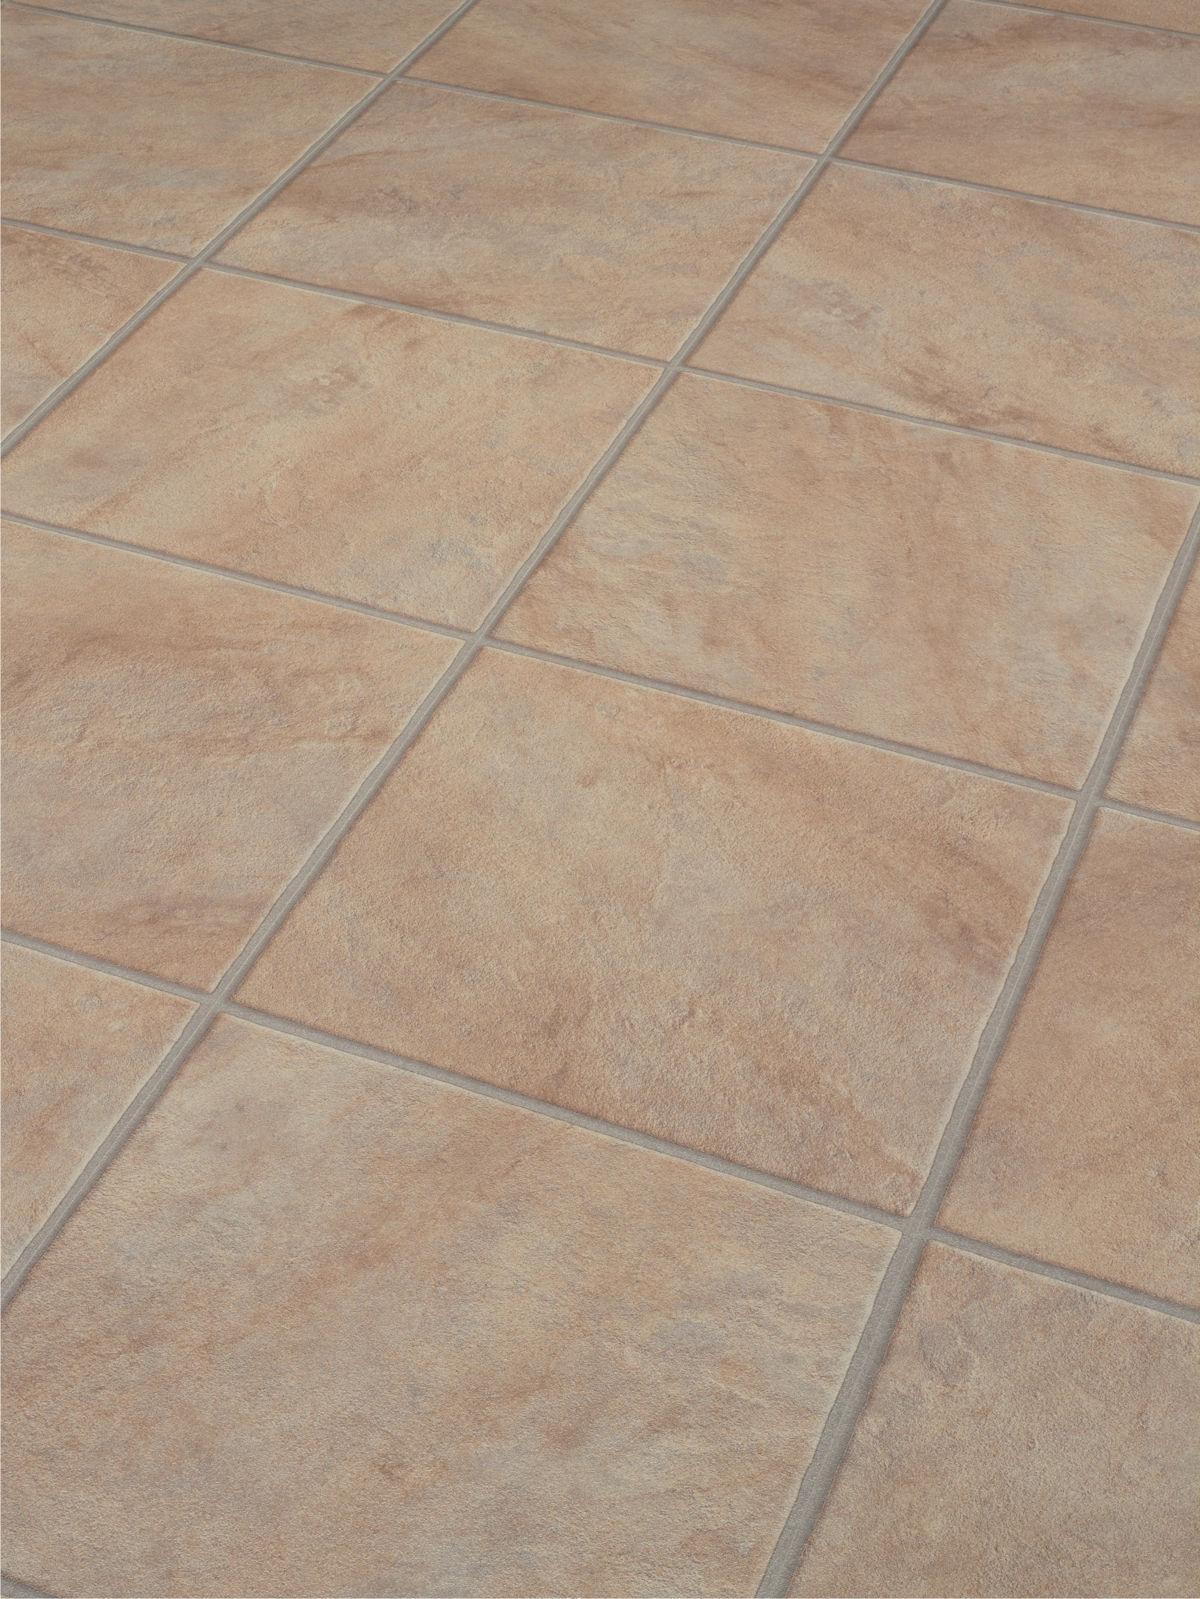 Kronospan Stoneline Xl Moroccan Stone Laminate Flooring